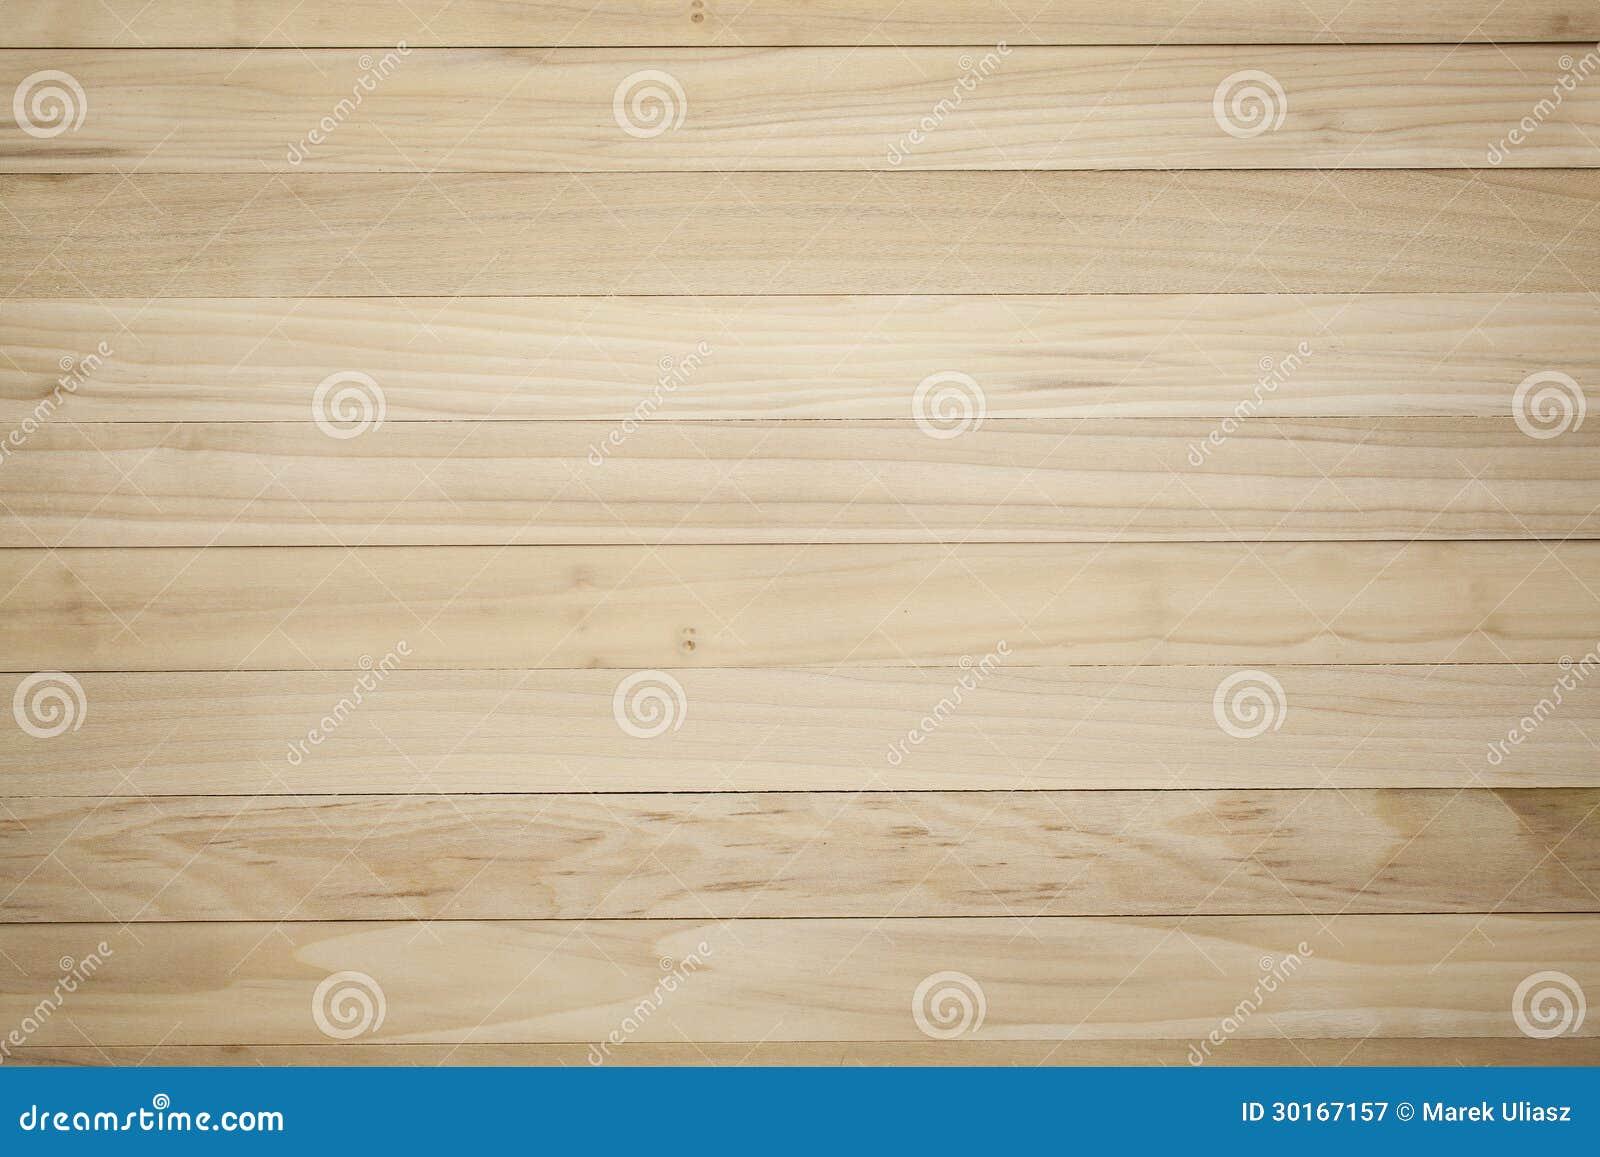 Poplar Wood Texture Royalty Free Stock Photography  Image 30167157 ~ Bois De Peuplier